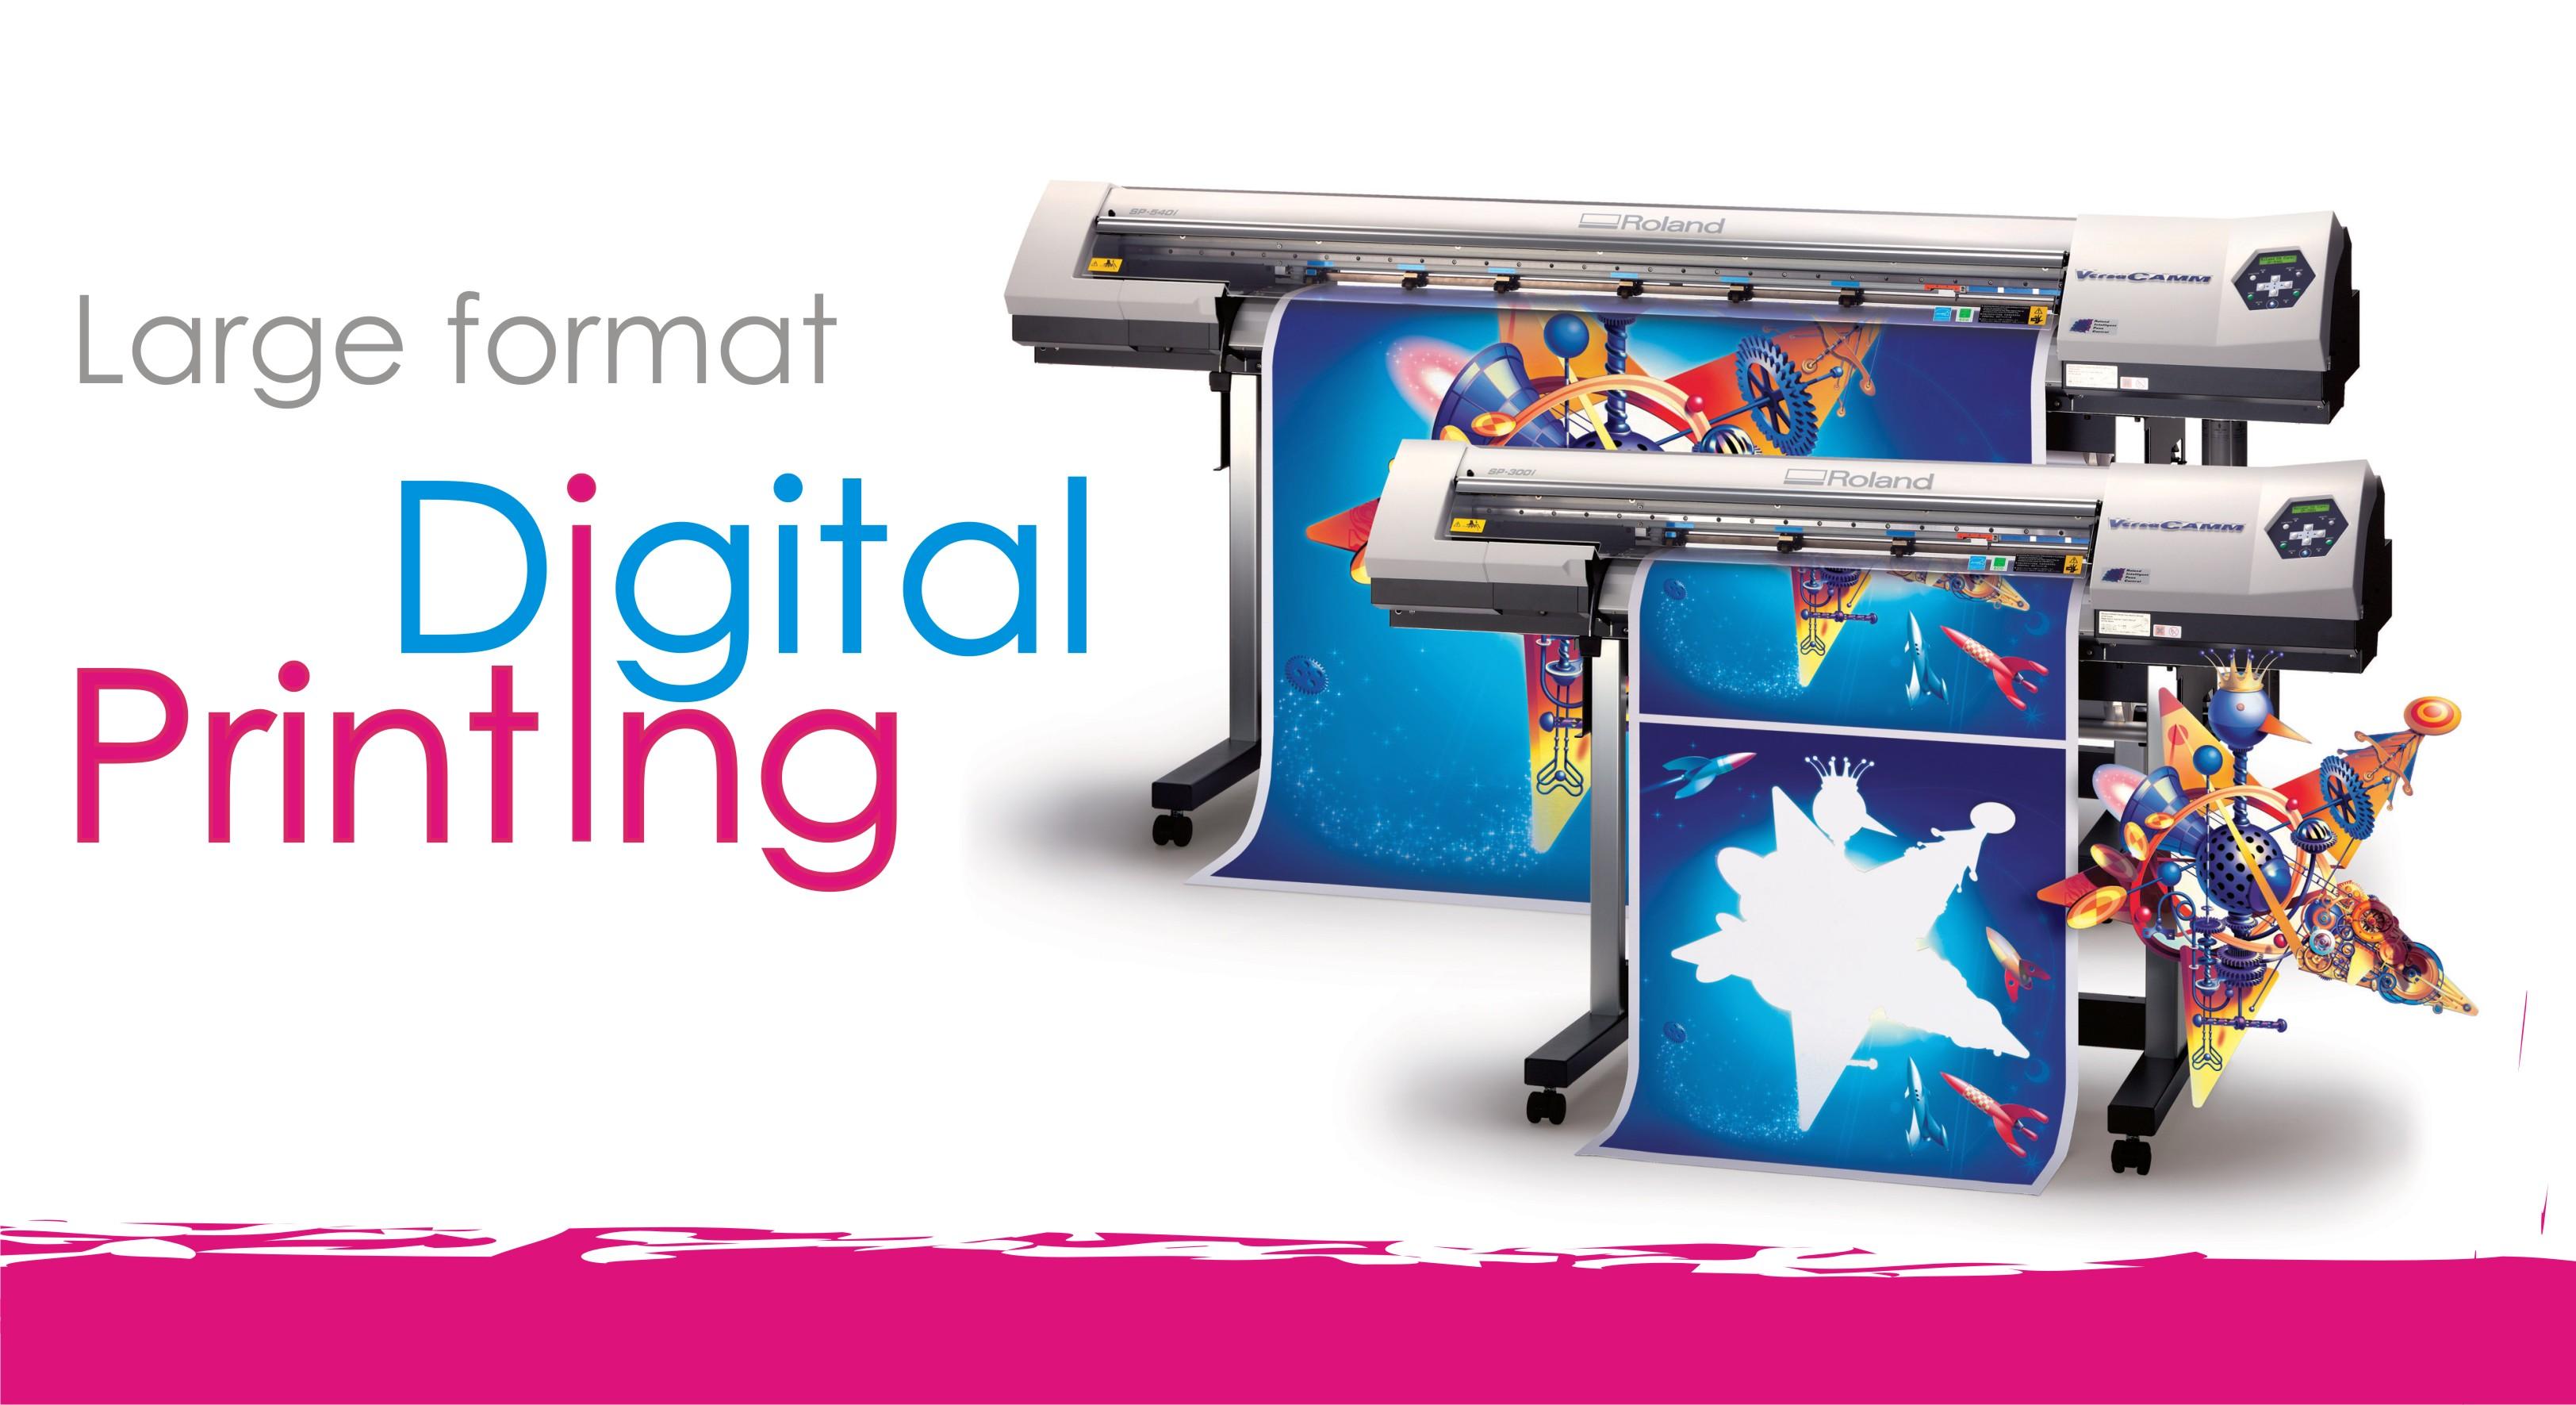 Digital Print Fulfillment - Spectra Integration